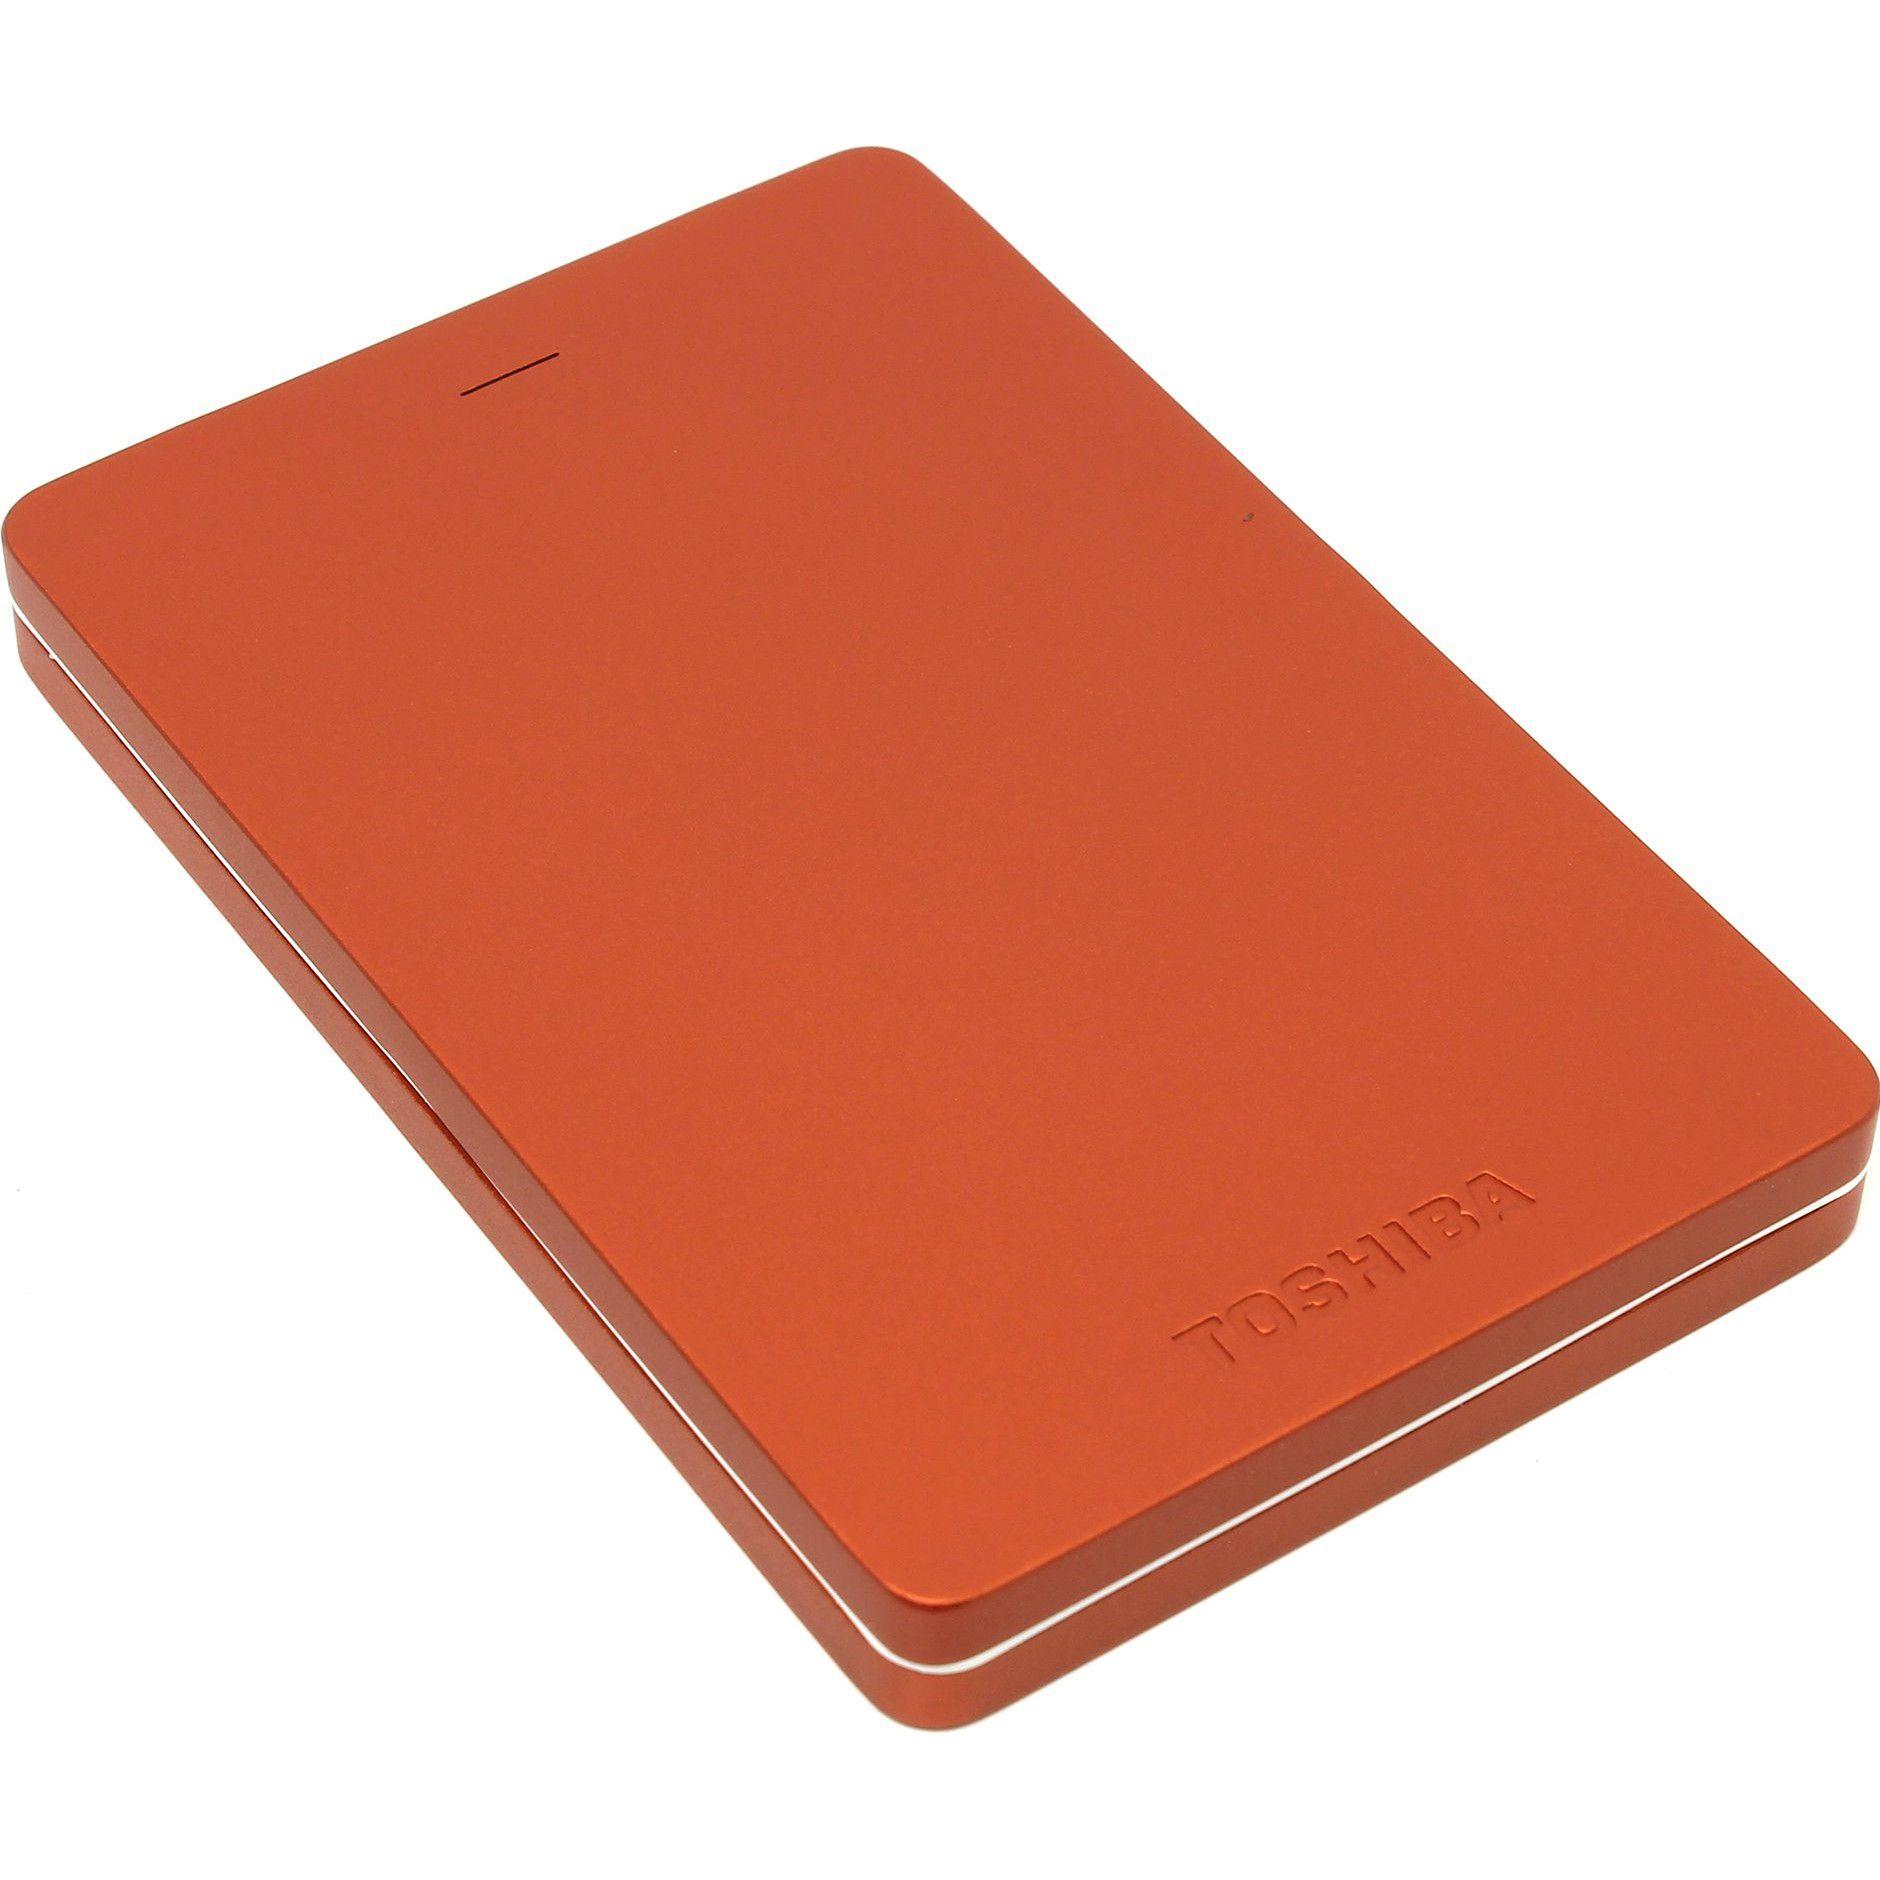 Hard Disk Extern Toshiba Canvio Alu 2TB USB 3.0 Red